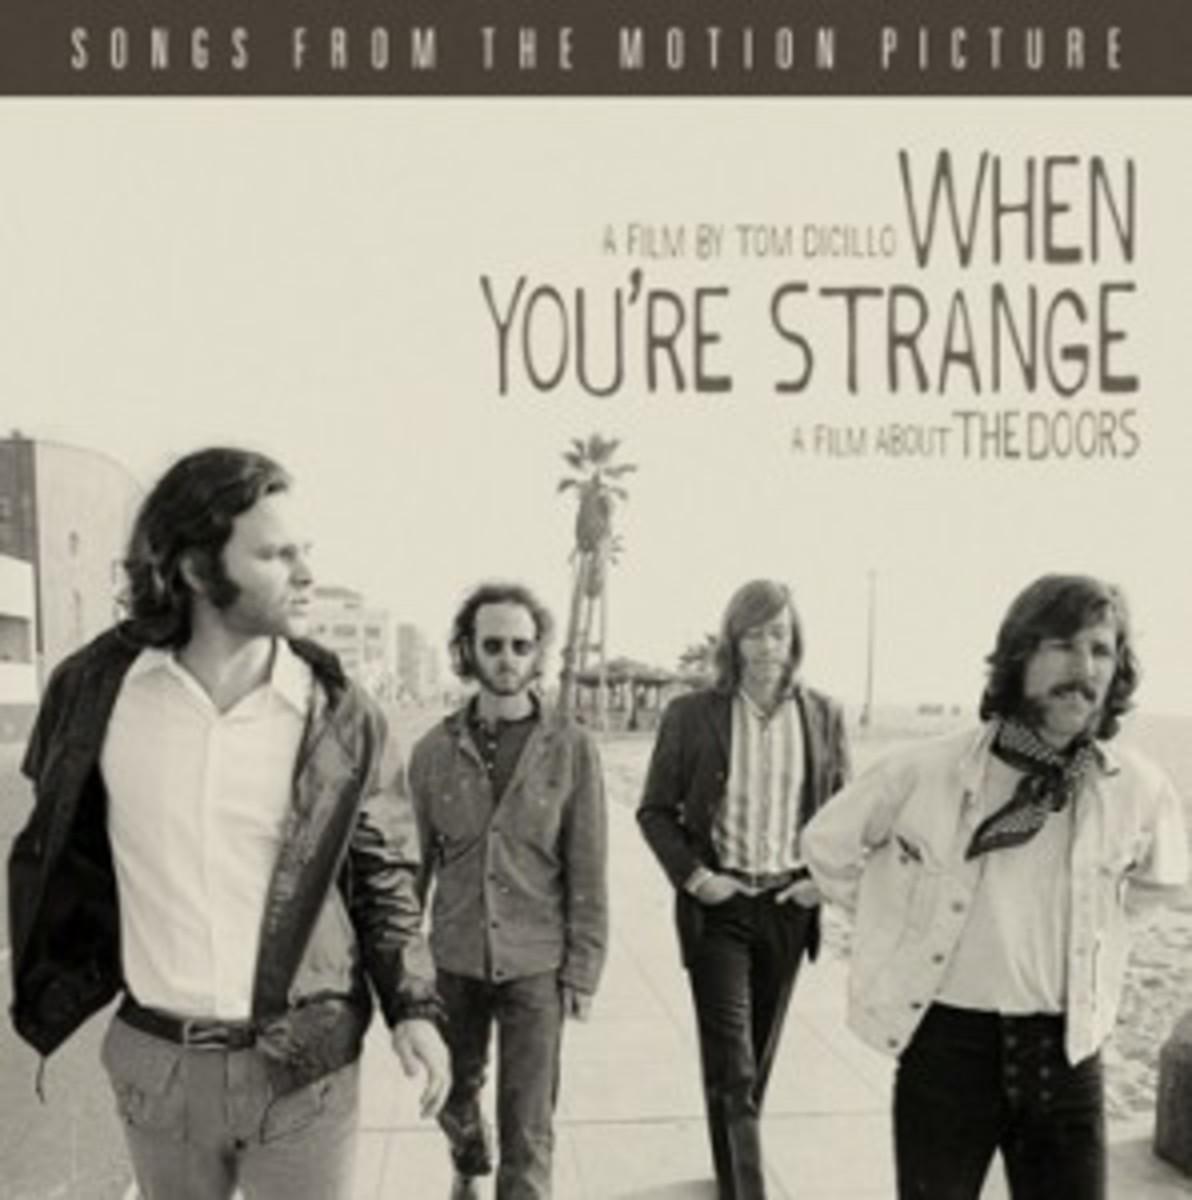 When_Youre_Strange